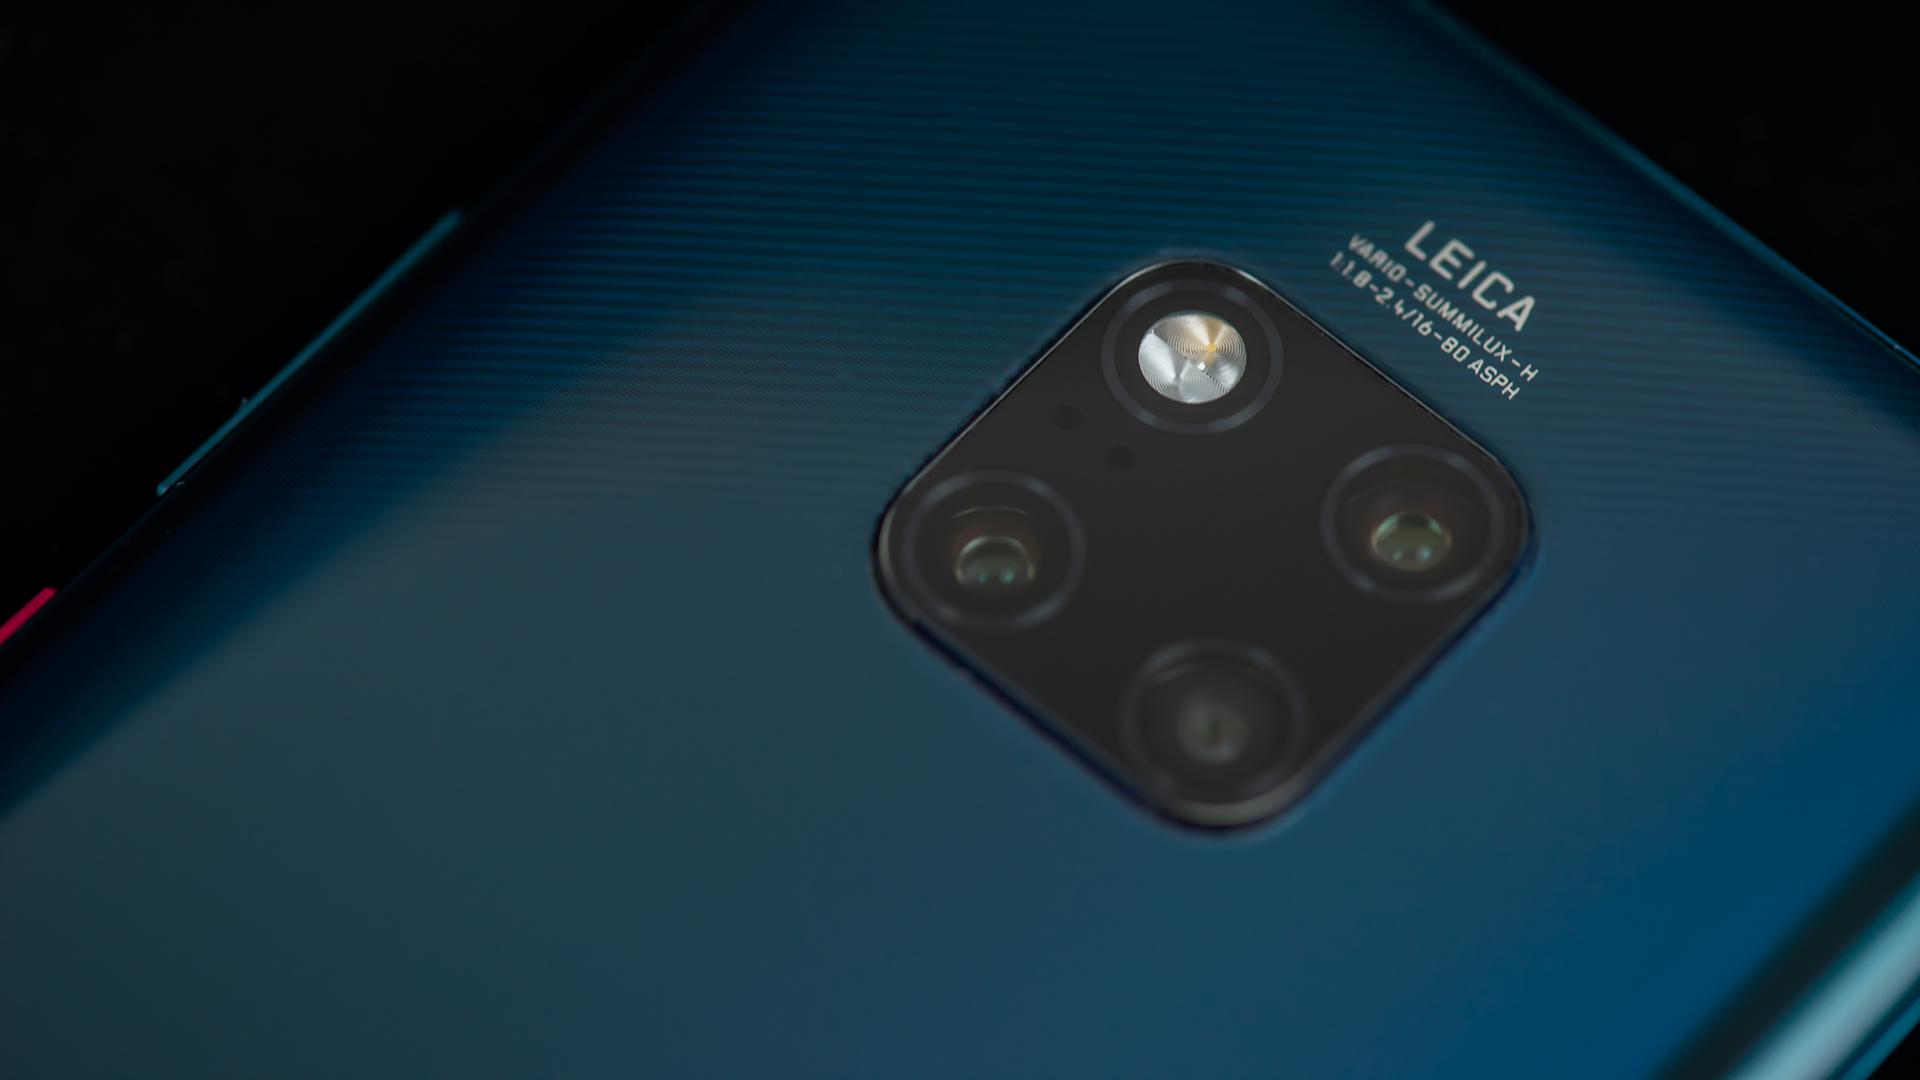 QnA VBage Huawei Mate 20 Pro camera review